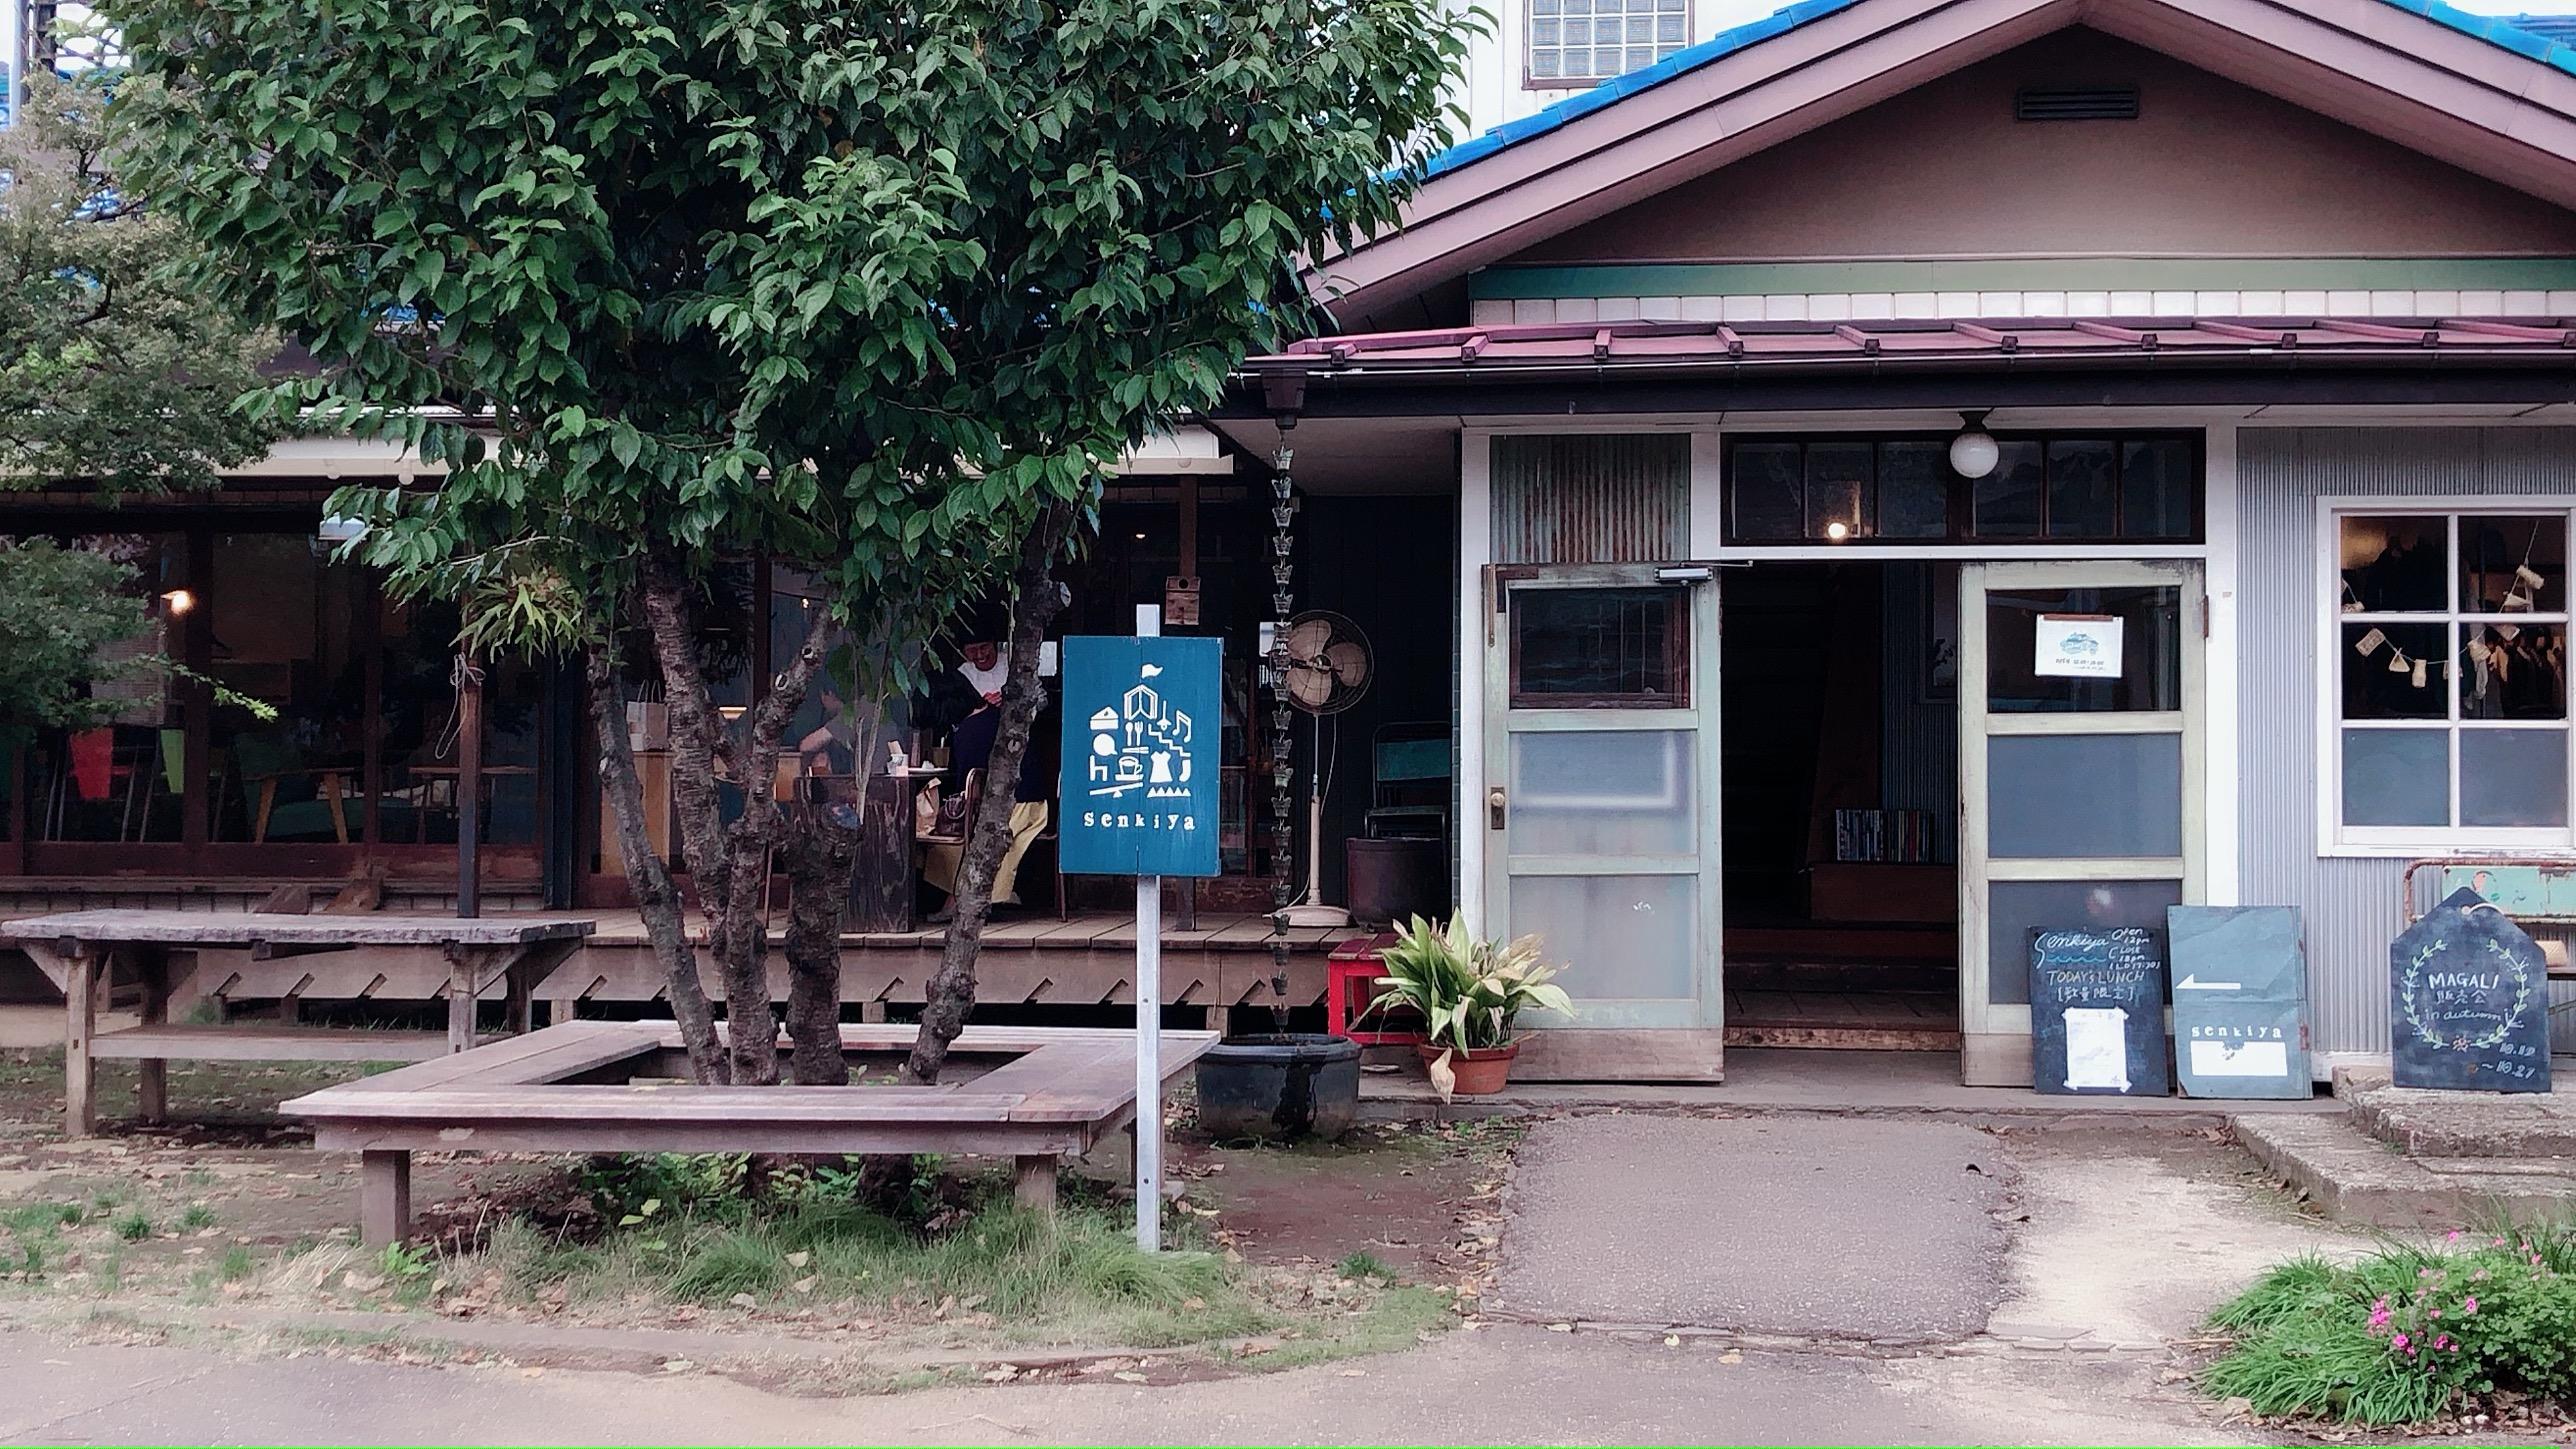 senkiya素敵なカフェでした